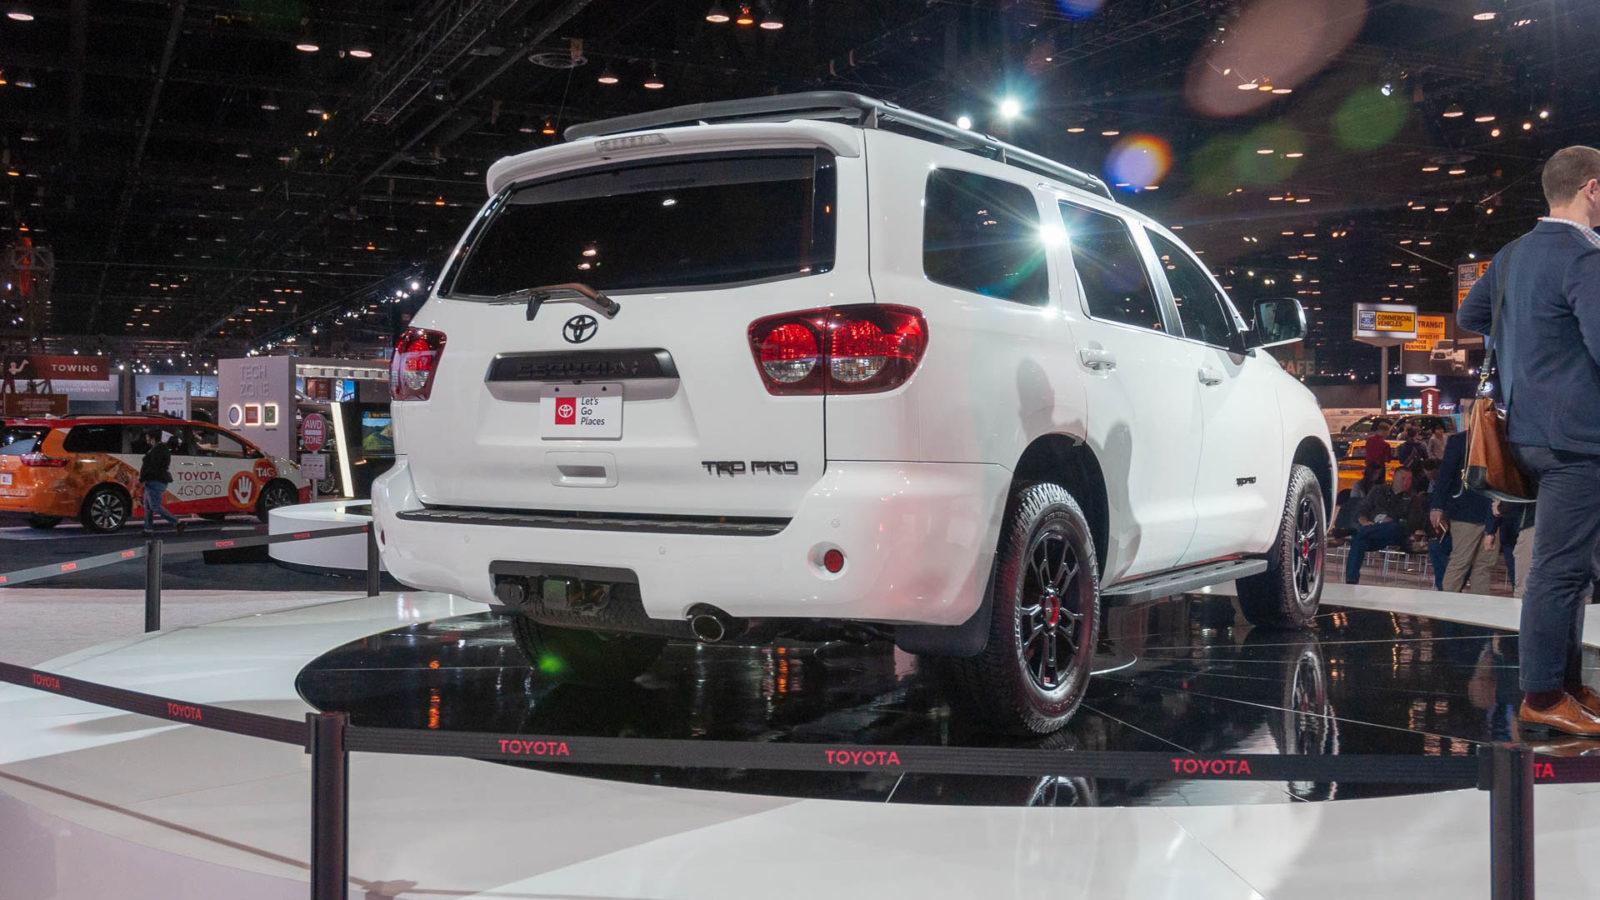 2020 Toyota Sequoia TRD Pro foto, jekster'er, vid szadi, tehnicheskie harakteristiki, cena, data vyhoda video